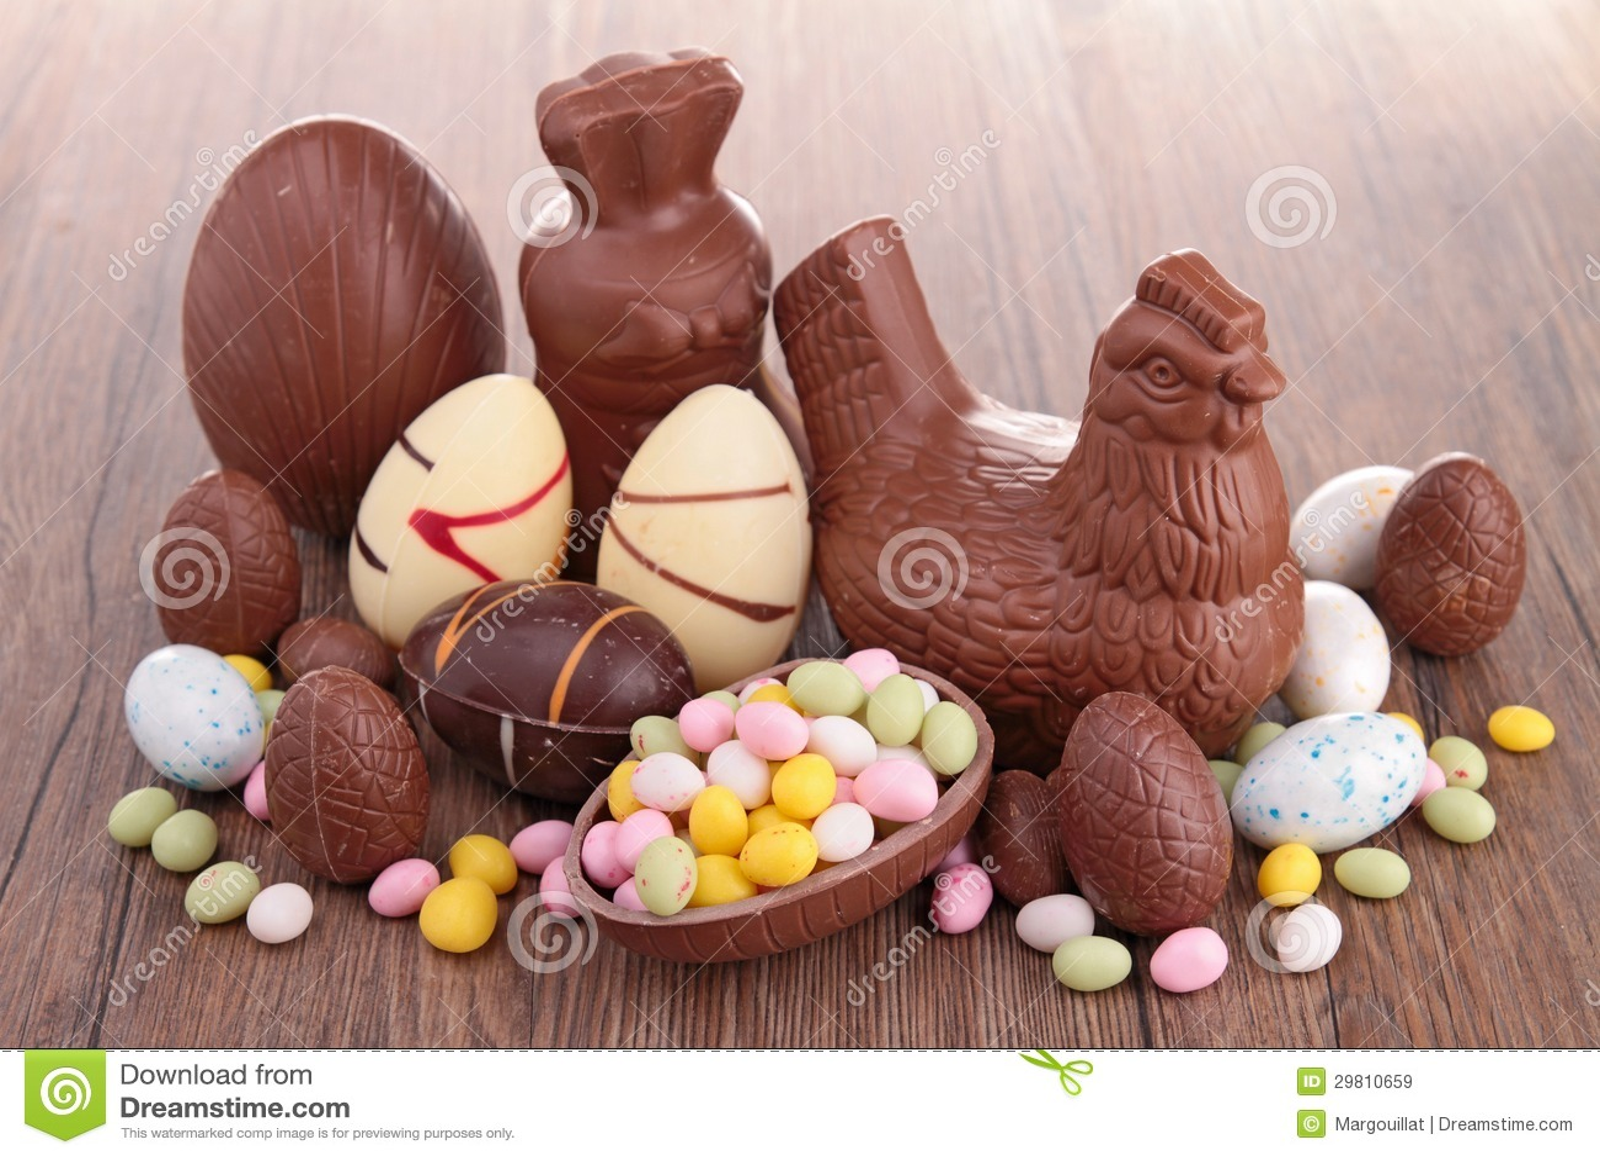 Chocolats de p ques images libres de droits image 29810659 - Recycler chocolat de paques ...